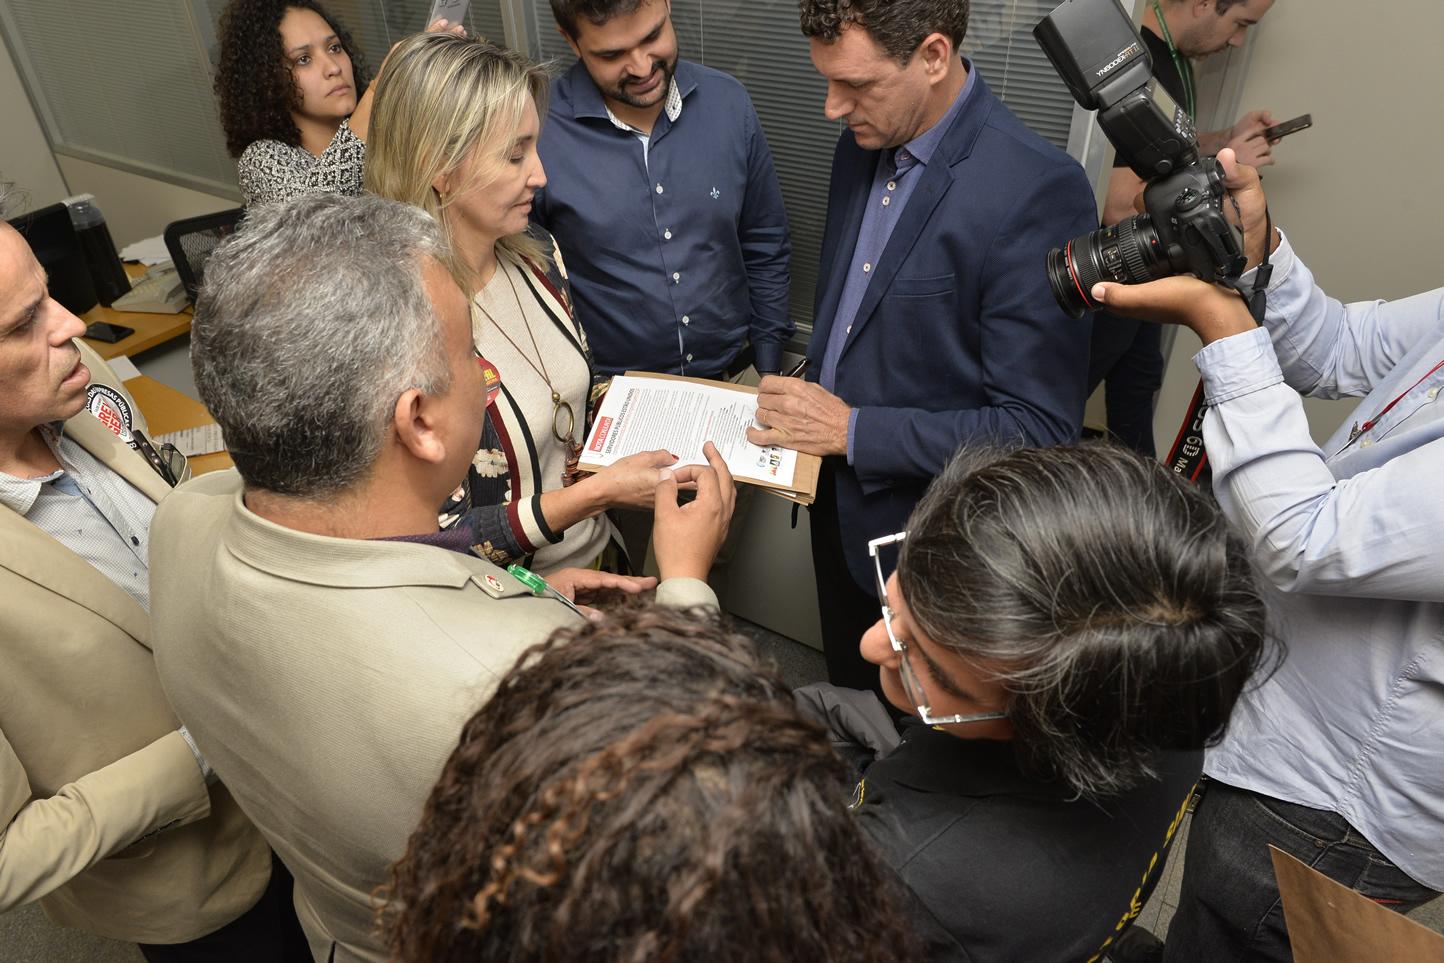 2019.06.13_Visita-aos-gabinetes-contra-o-fim-da-licenca-premio_fotos-Deva-Garcia-25